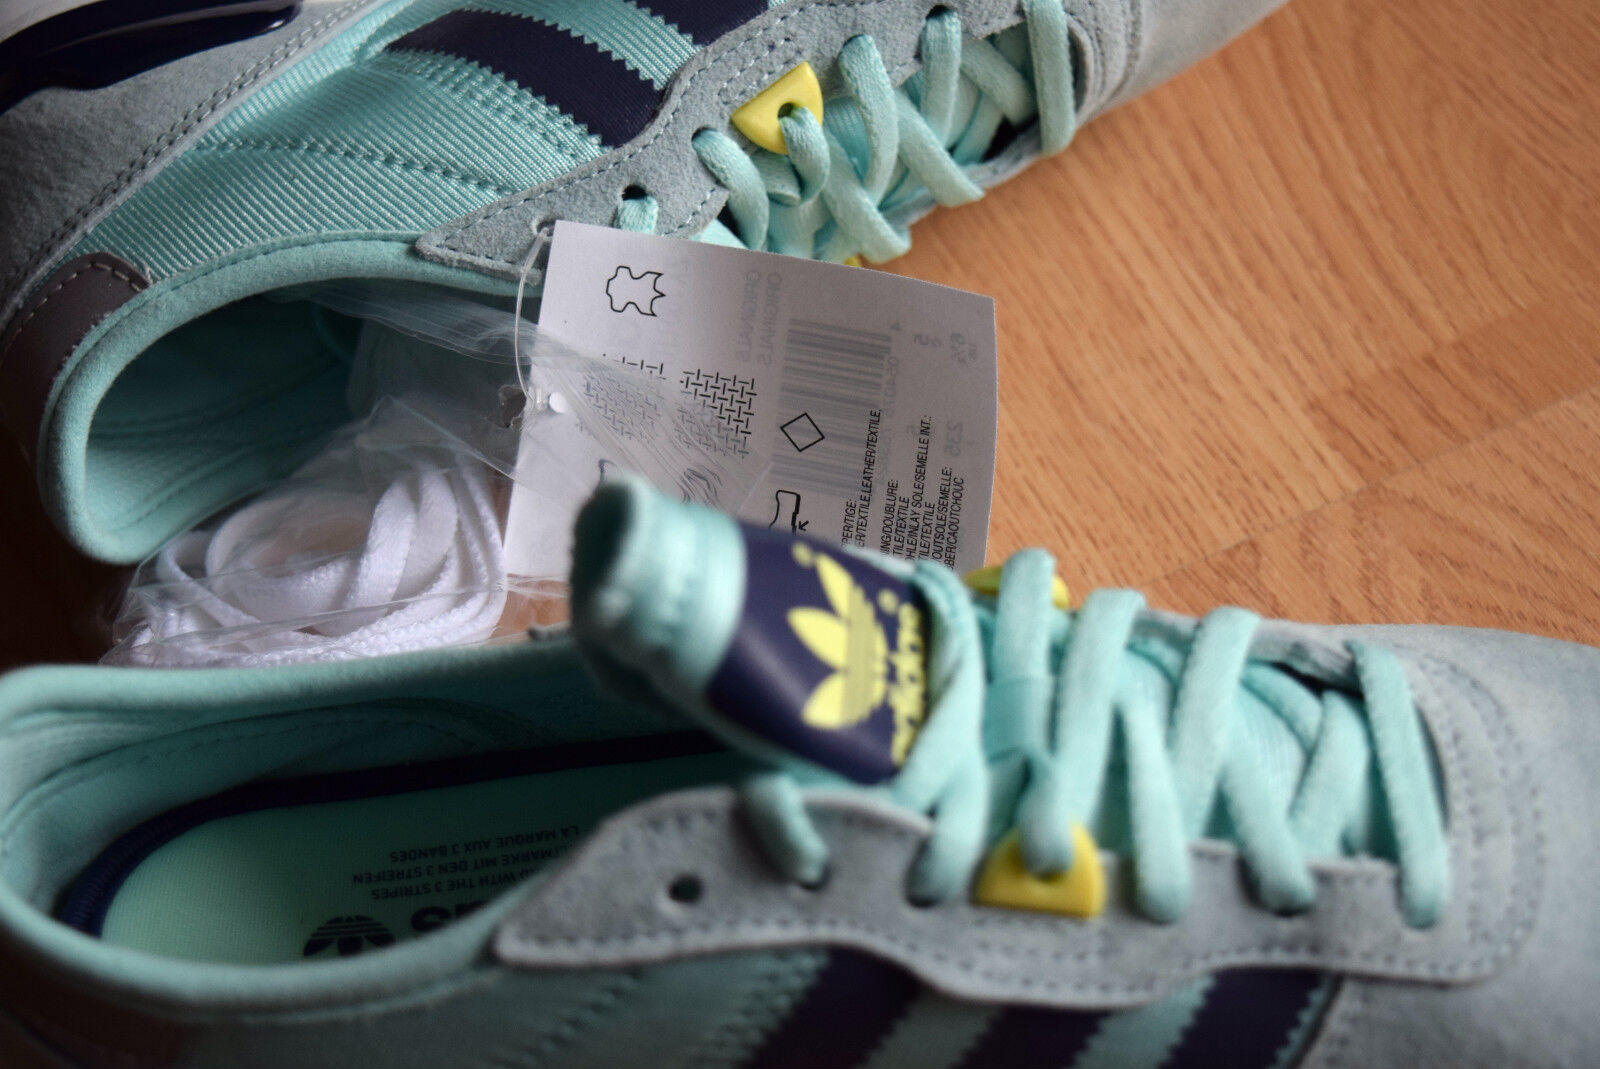 Adidas zx 36,5 700 Lithe W gr 36,5 zx 38 39 Vintage lA tRaInEr sl supeRstaR adistaR 500 61276c